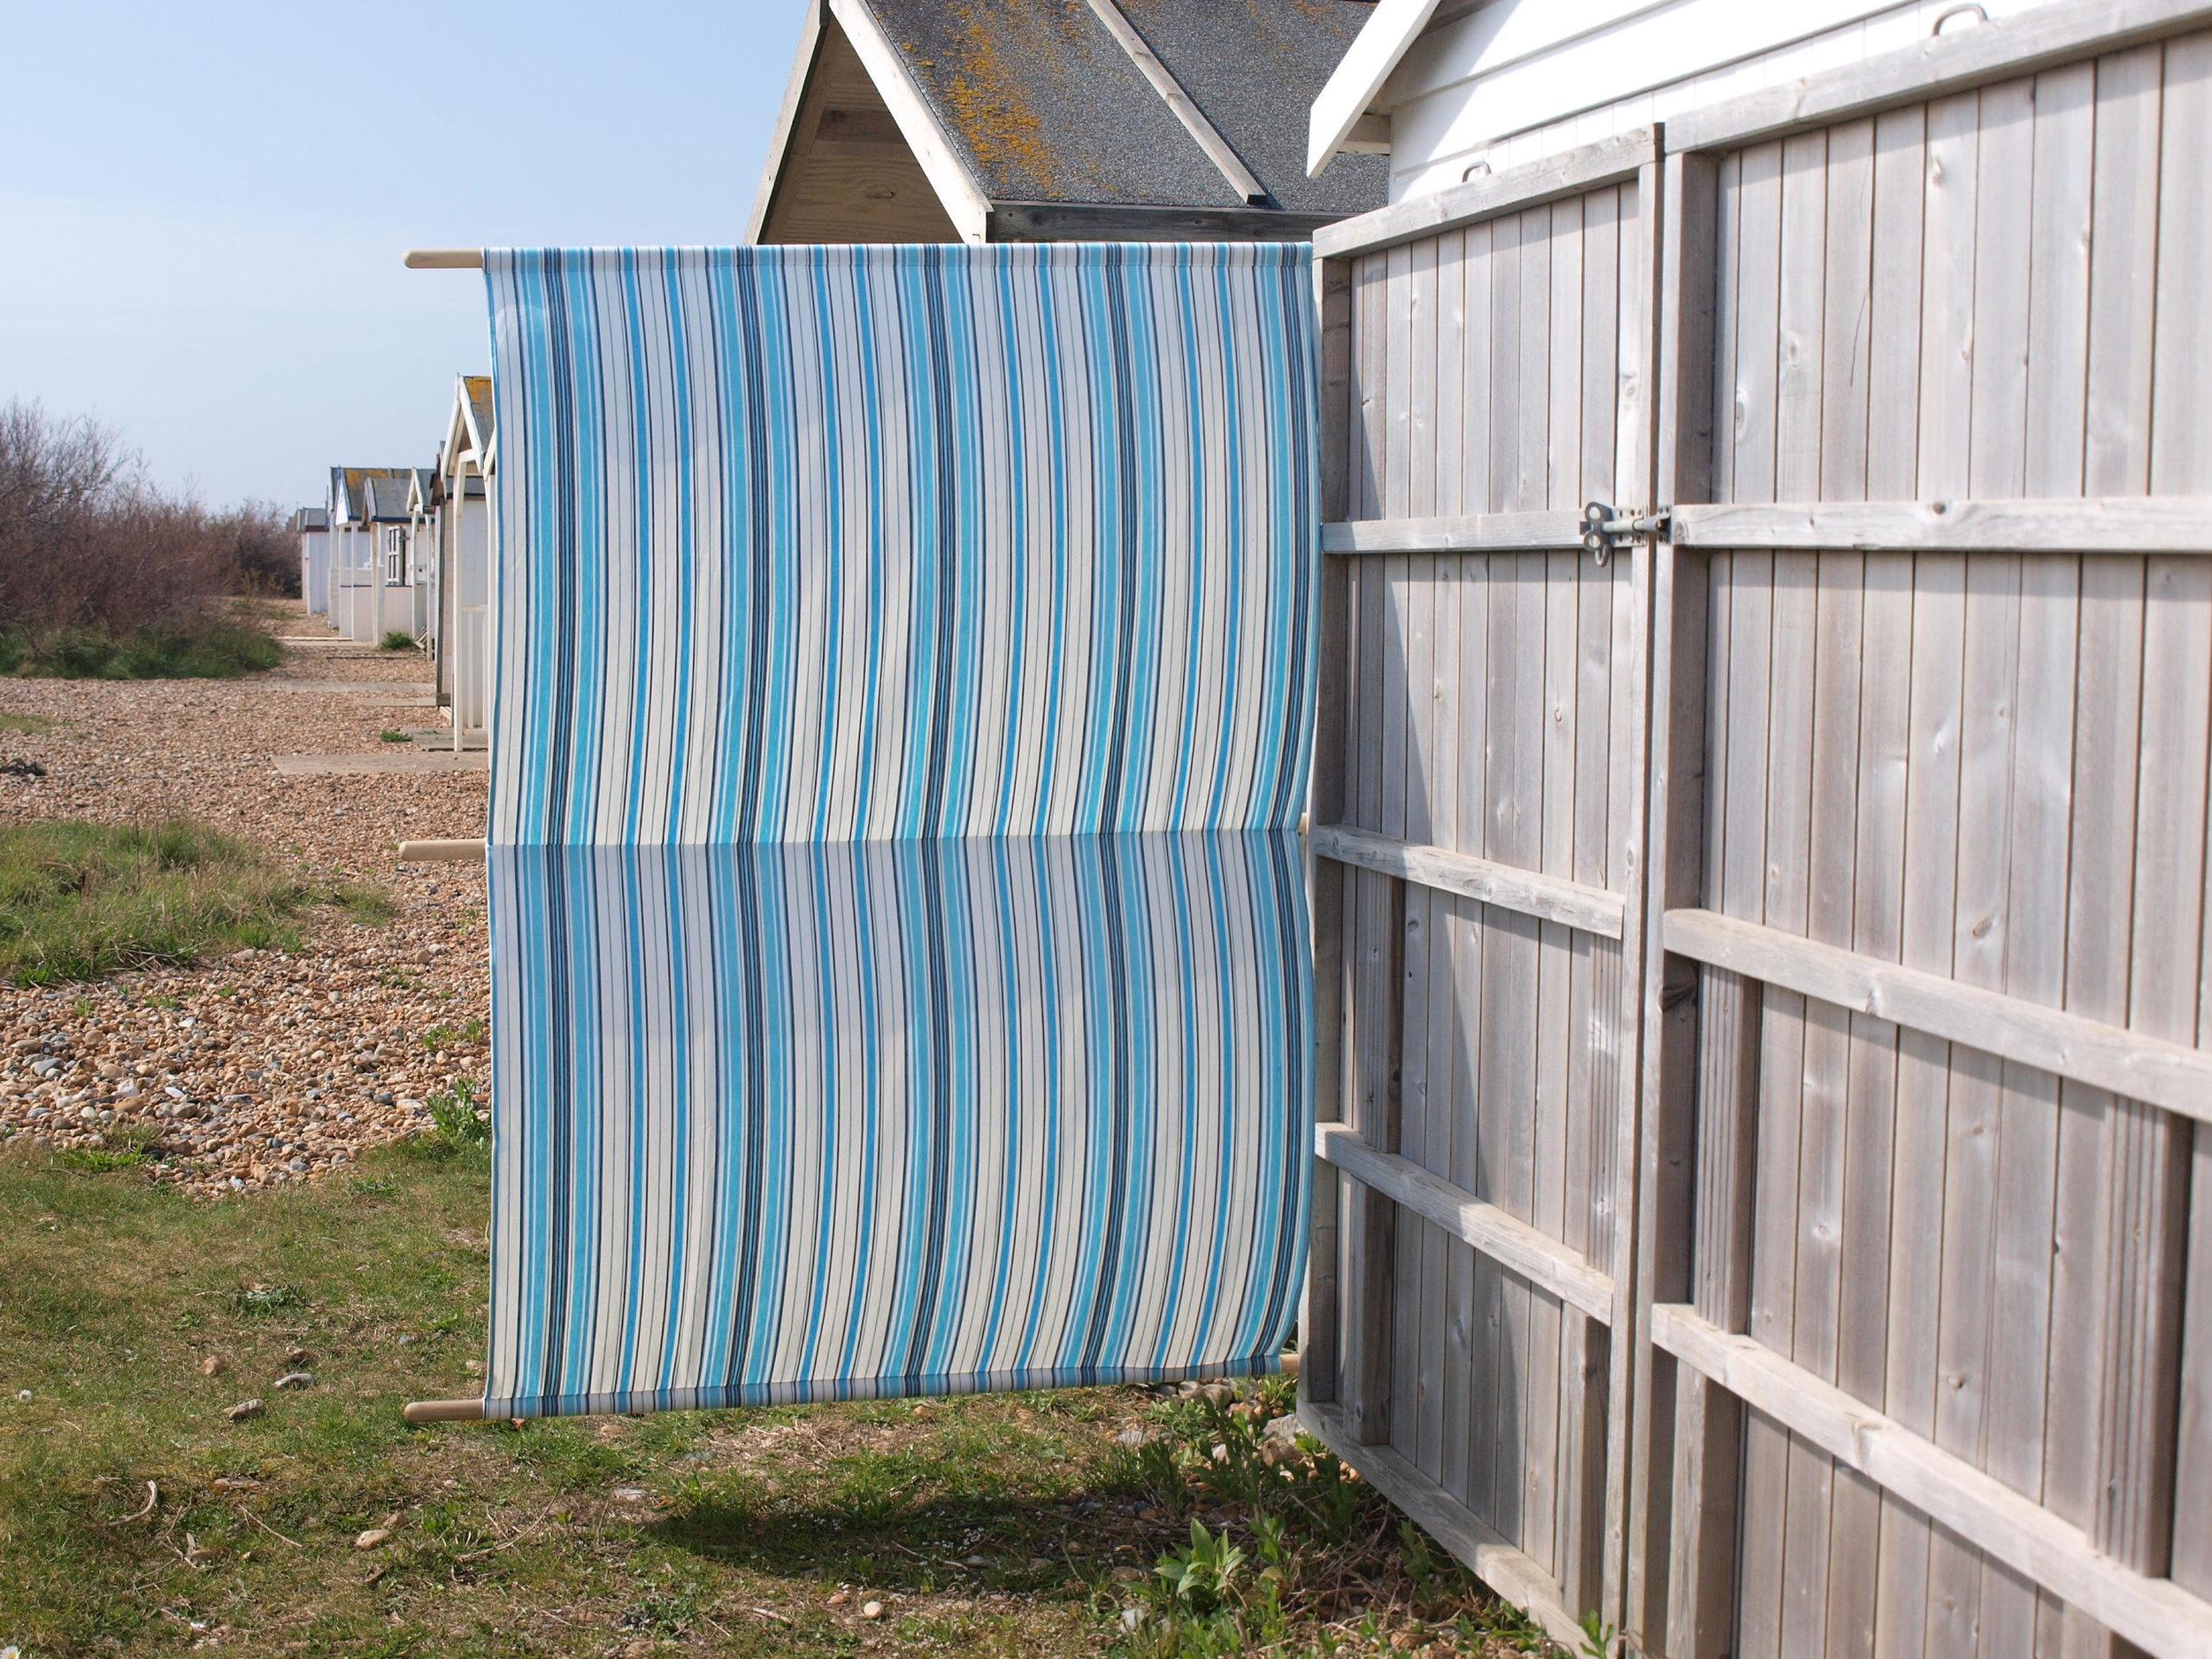 Hazydaze Beach Hut windbreak in 'Seaside'